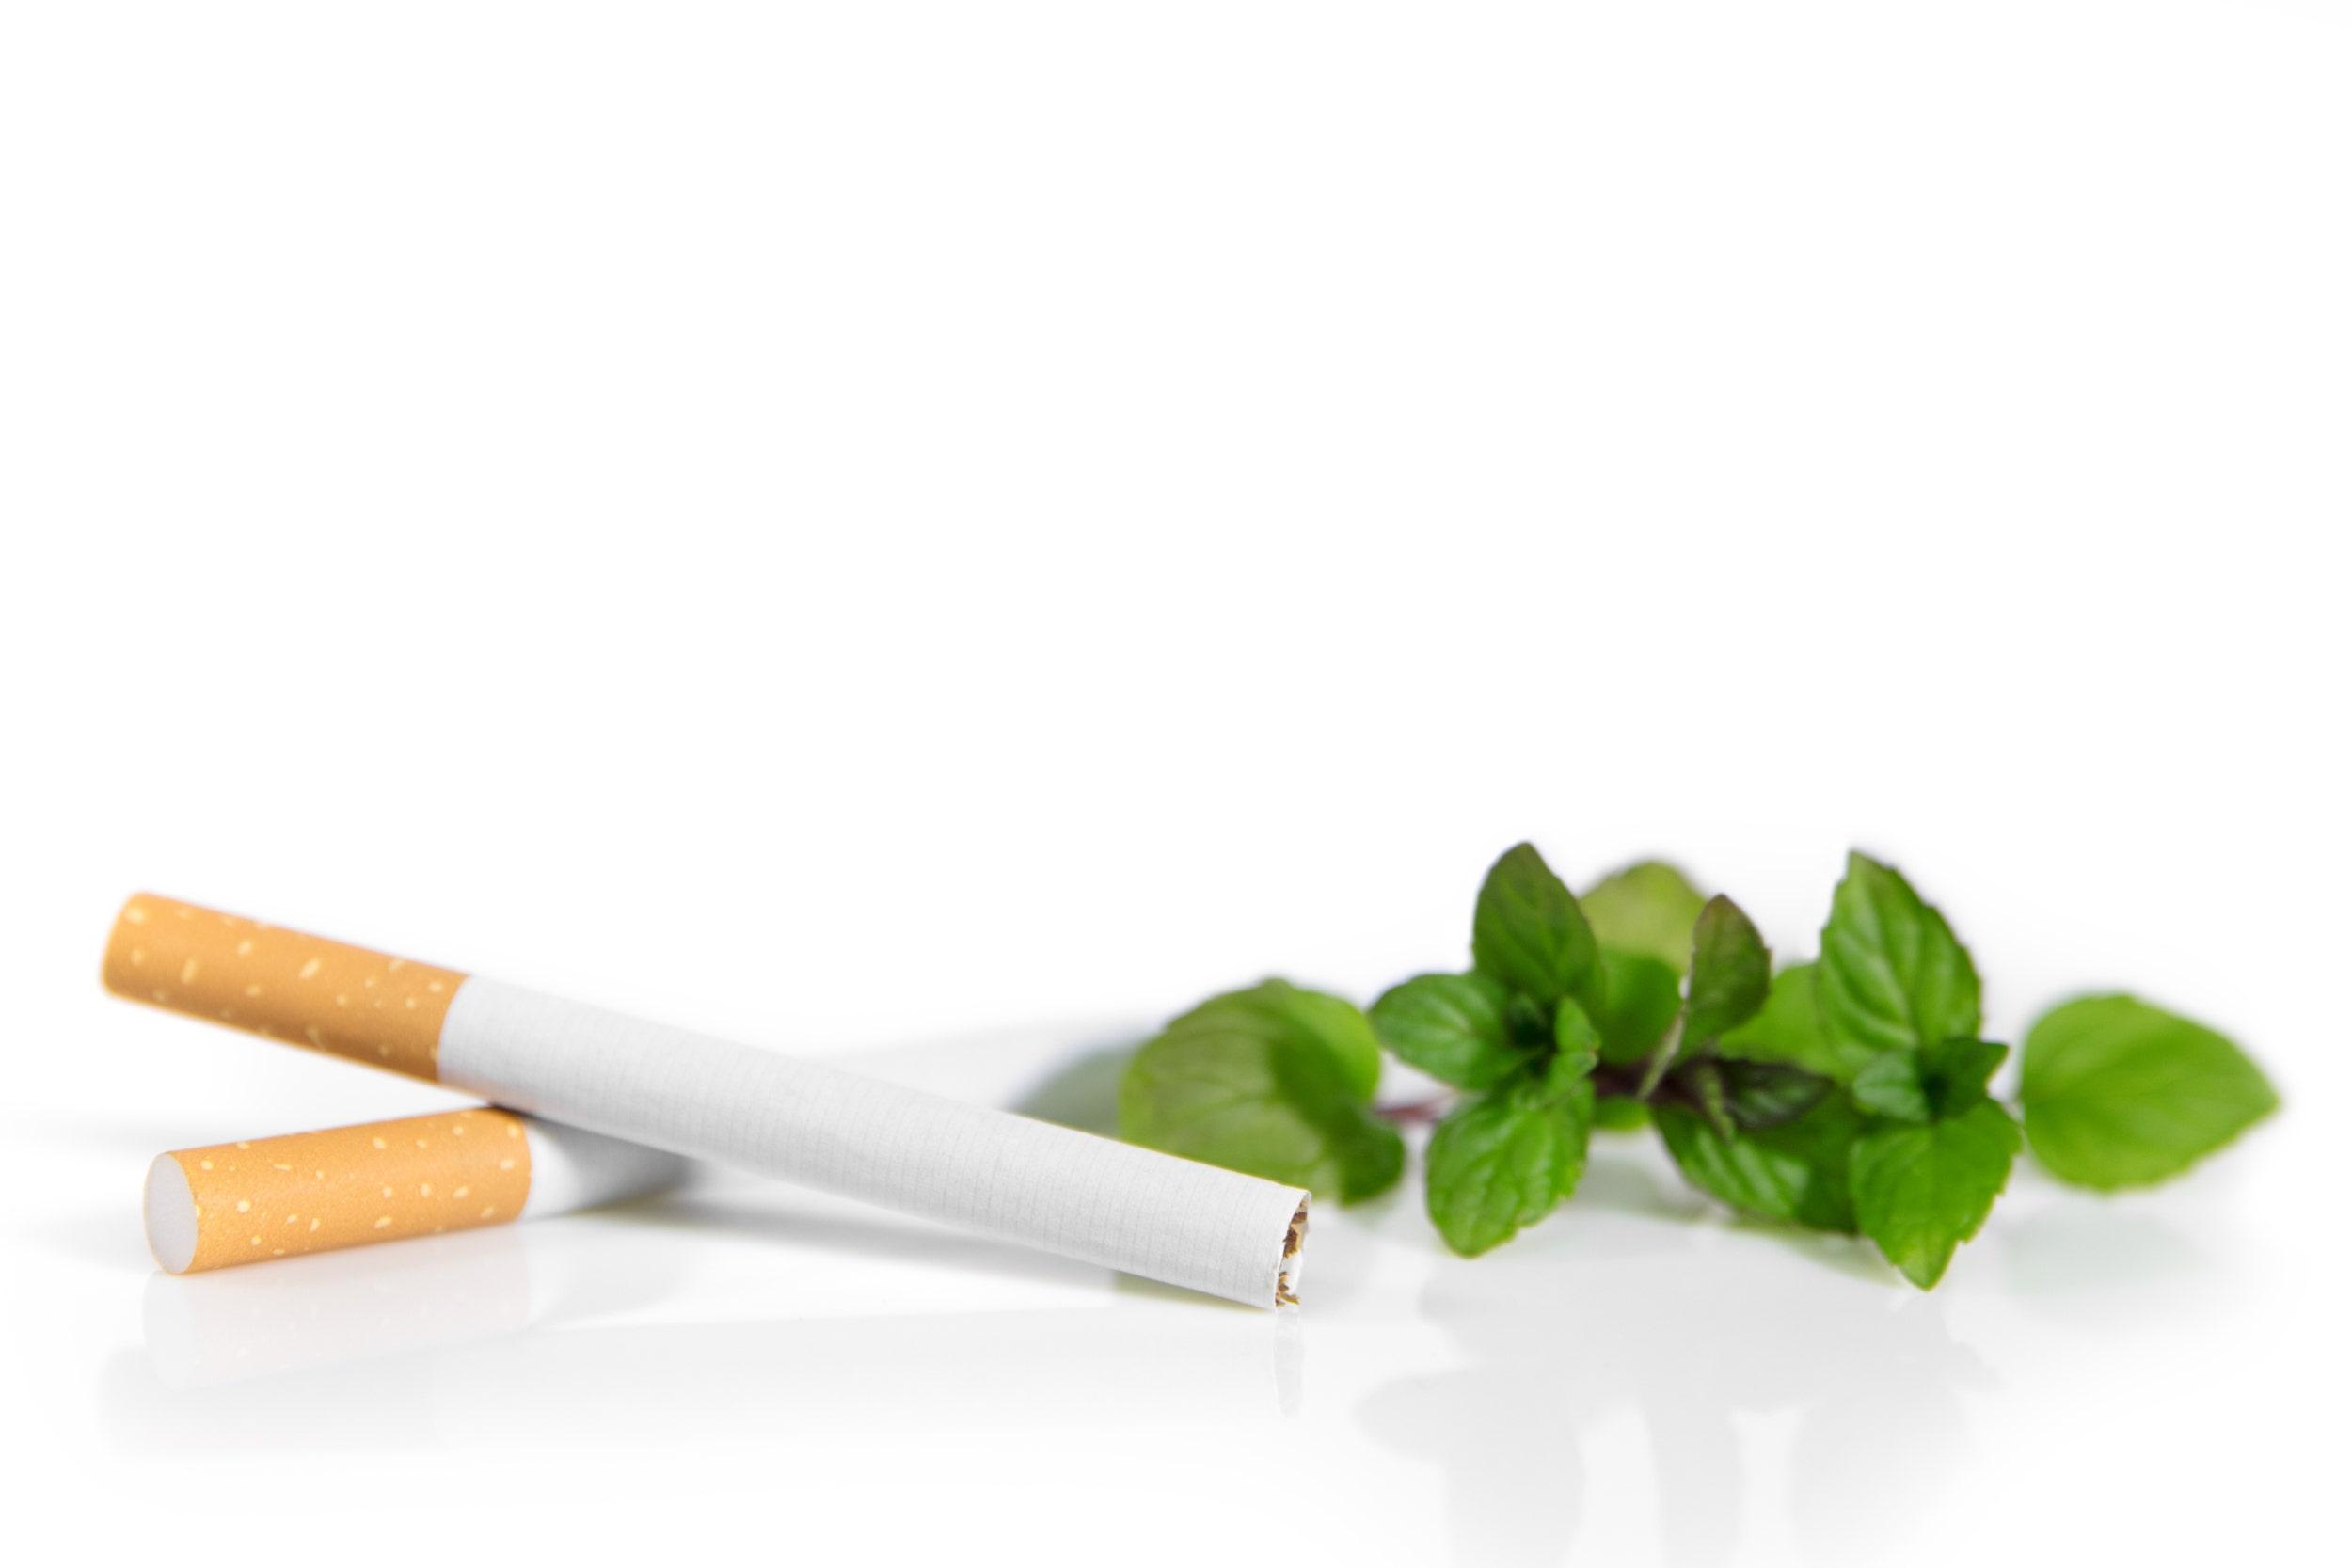 Menthol Cigarette (Image)